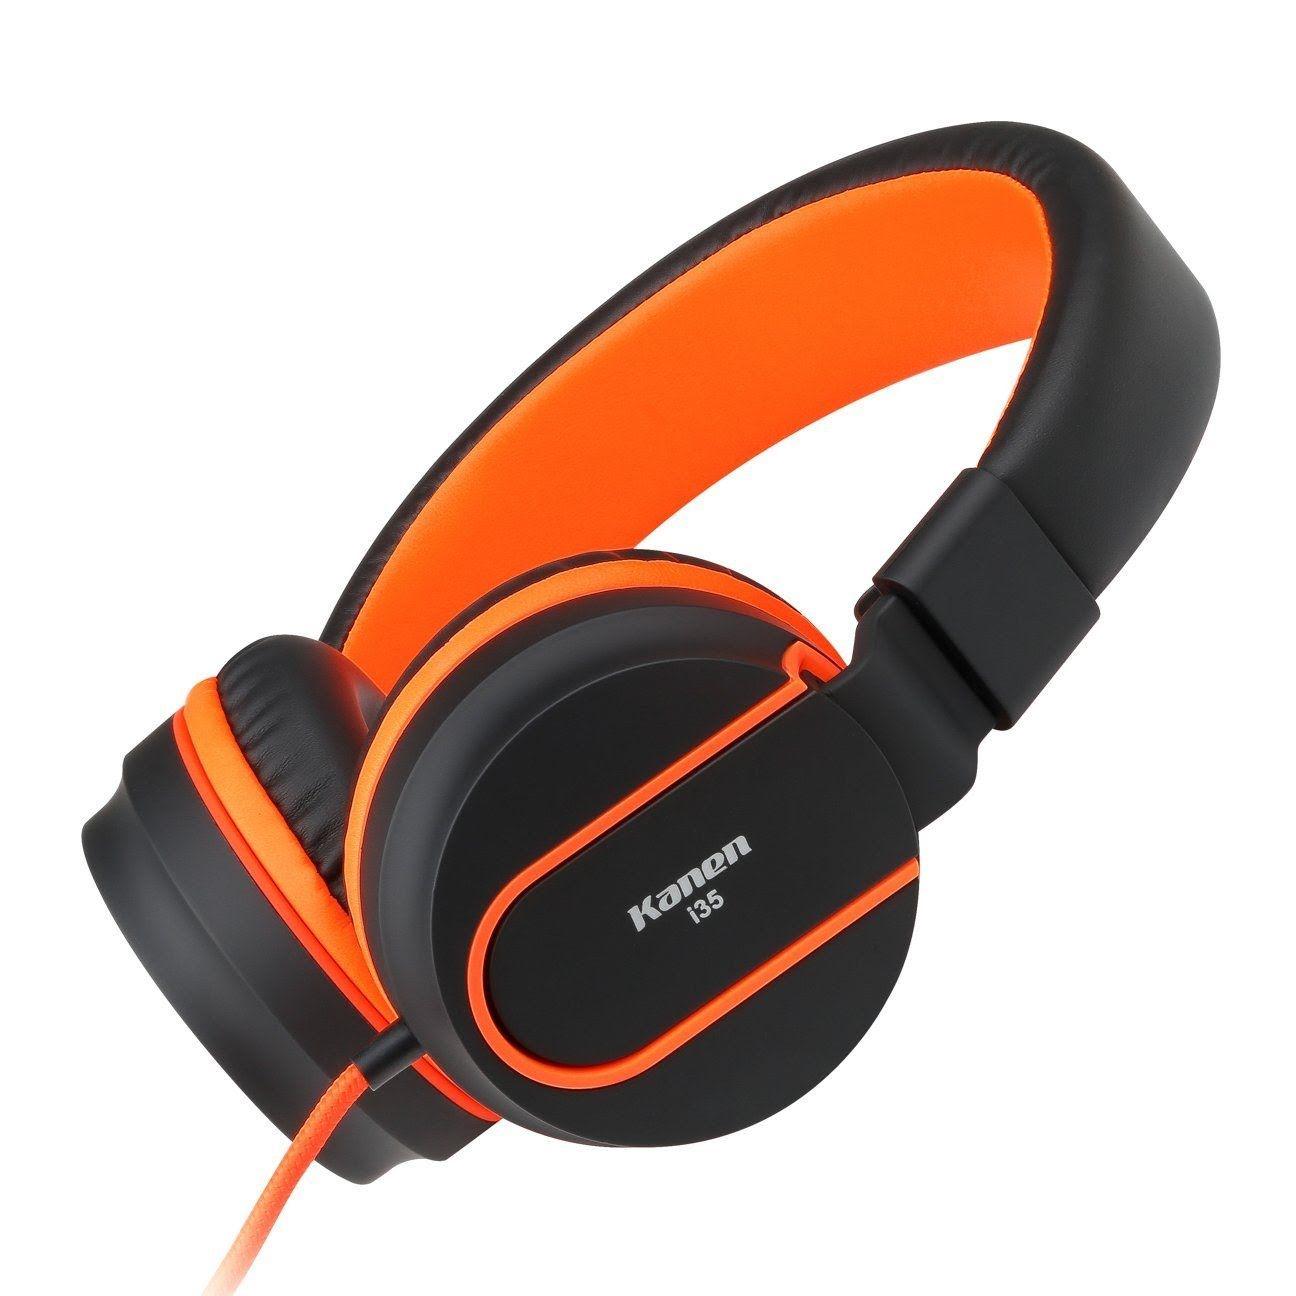 Orange earbuds kids - earbuds with microphone orange